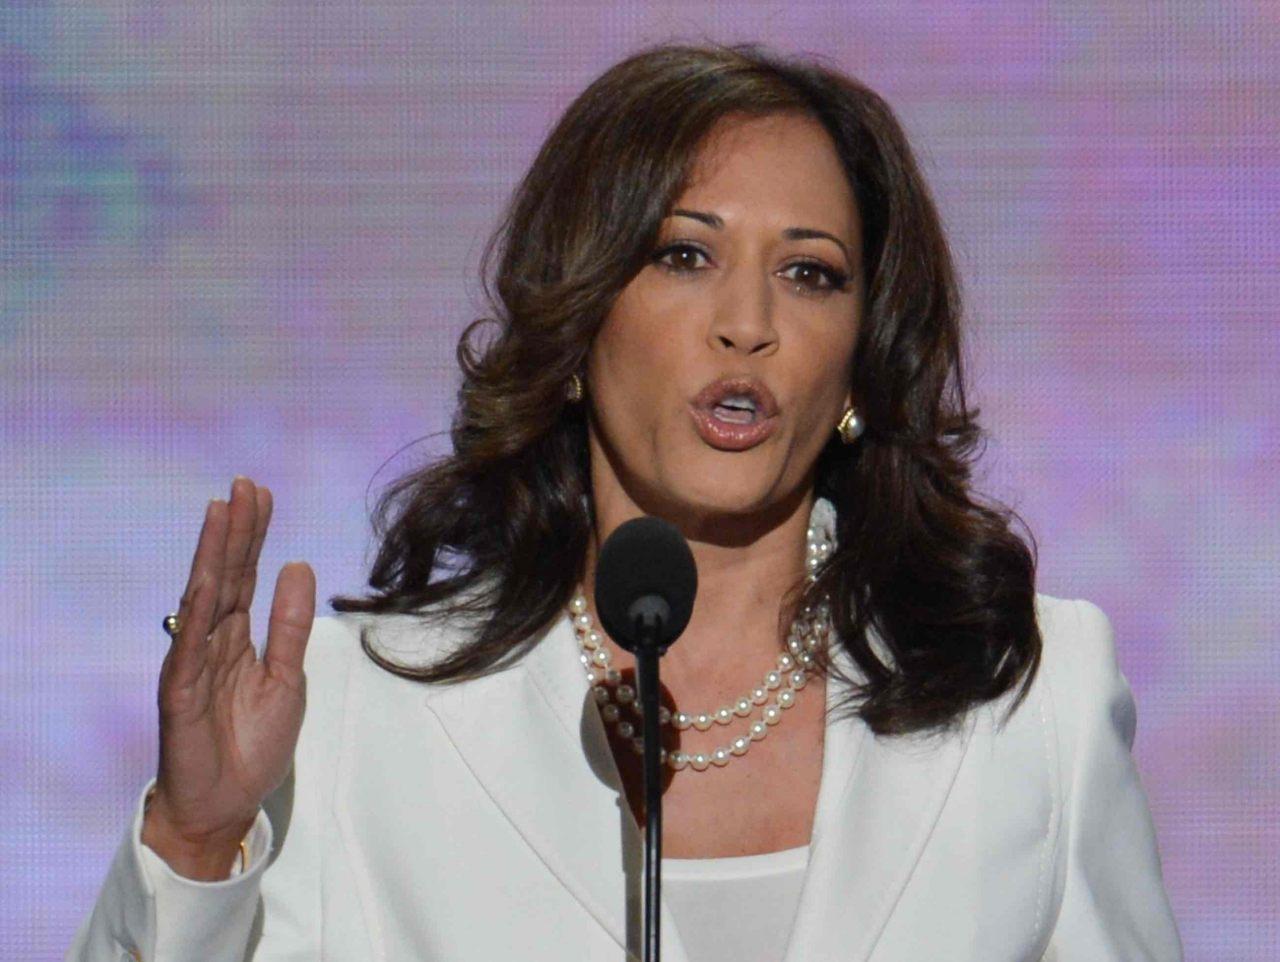 Kamala Harris I Support Oakland Mayor Who Helped Criminal Illegal Aliens Evade Deportation 100 Percent